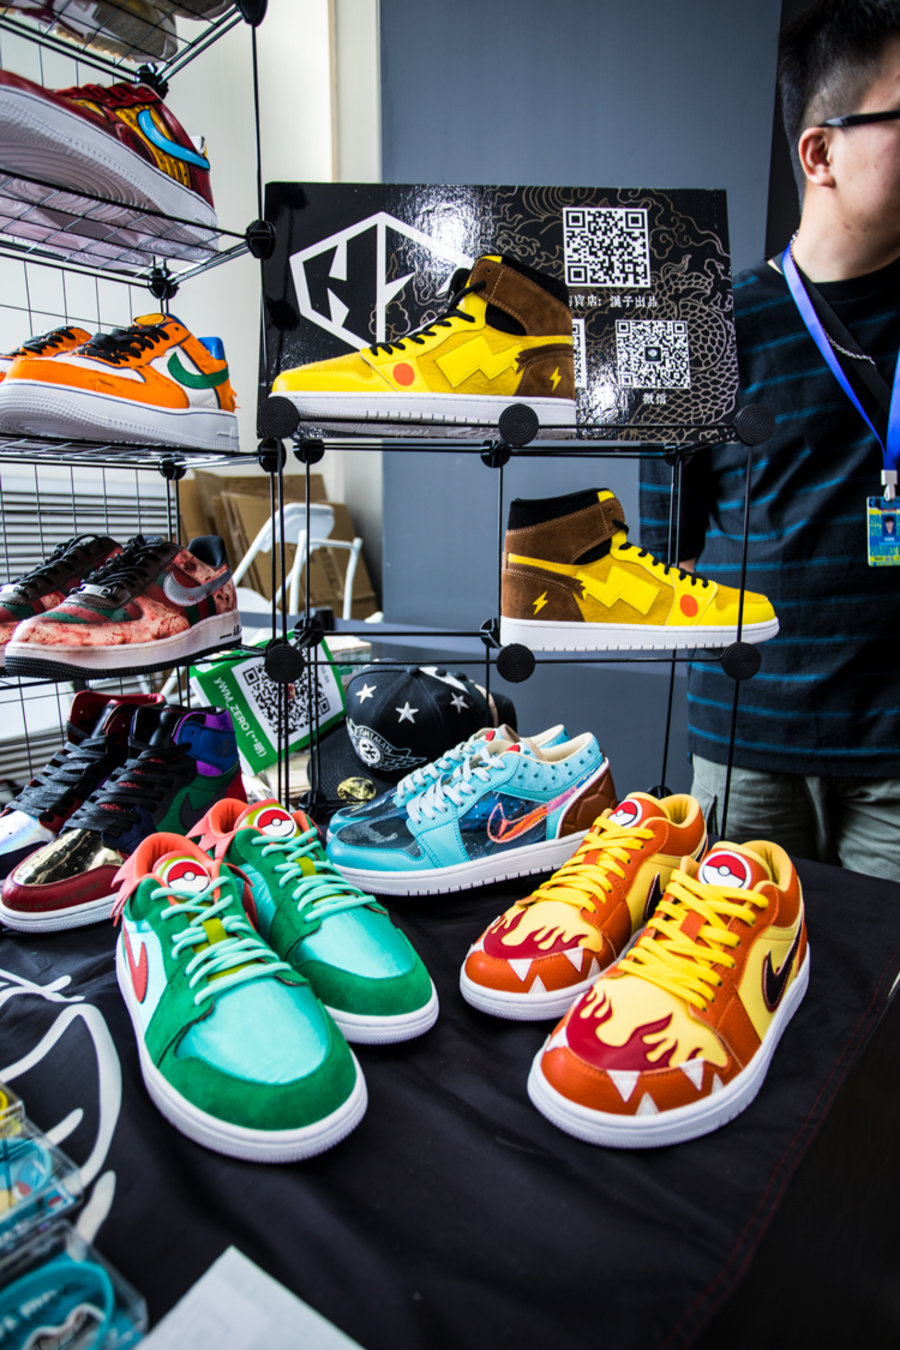 LV,Dior,Gucci,Nike,AJ1  LV、Dior、Gucci 都能联名 AJ1!这些球鞋平时你根本见不到!